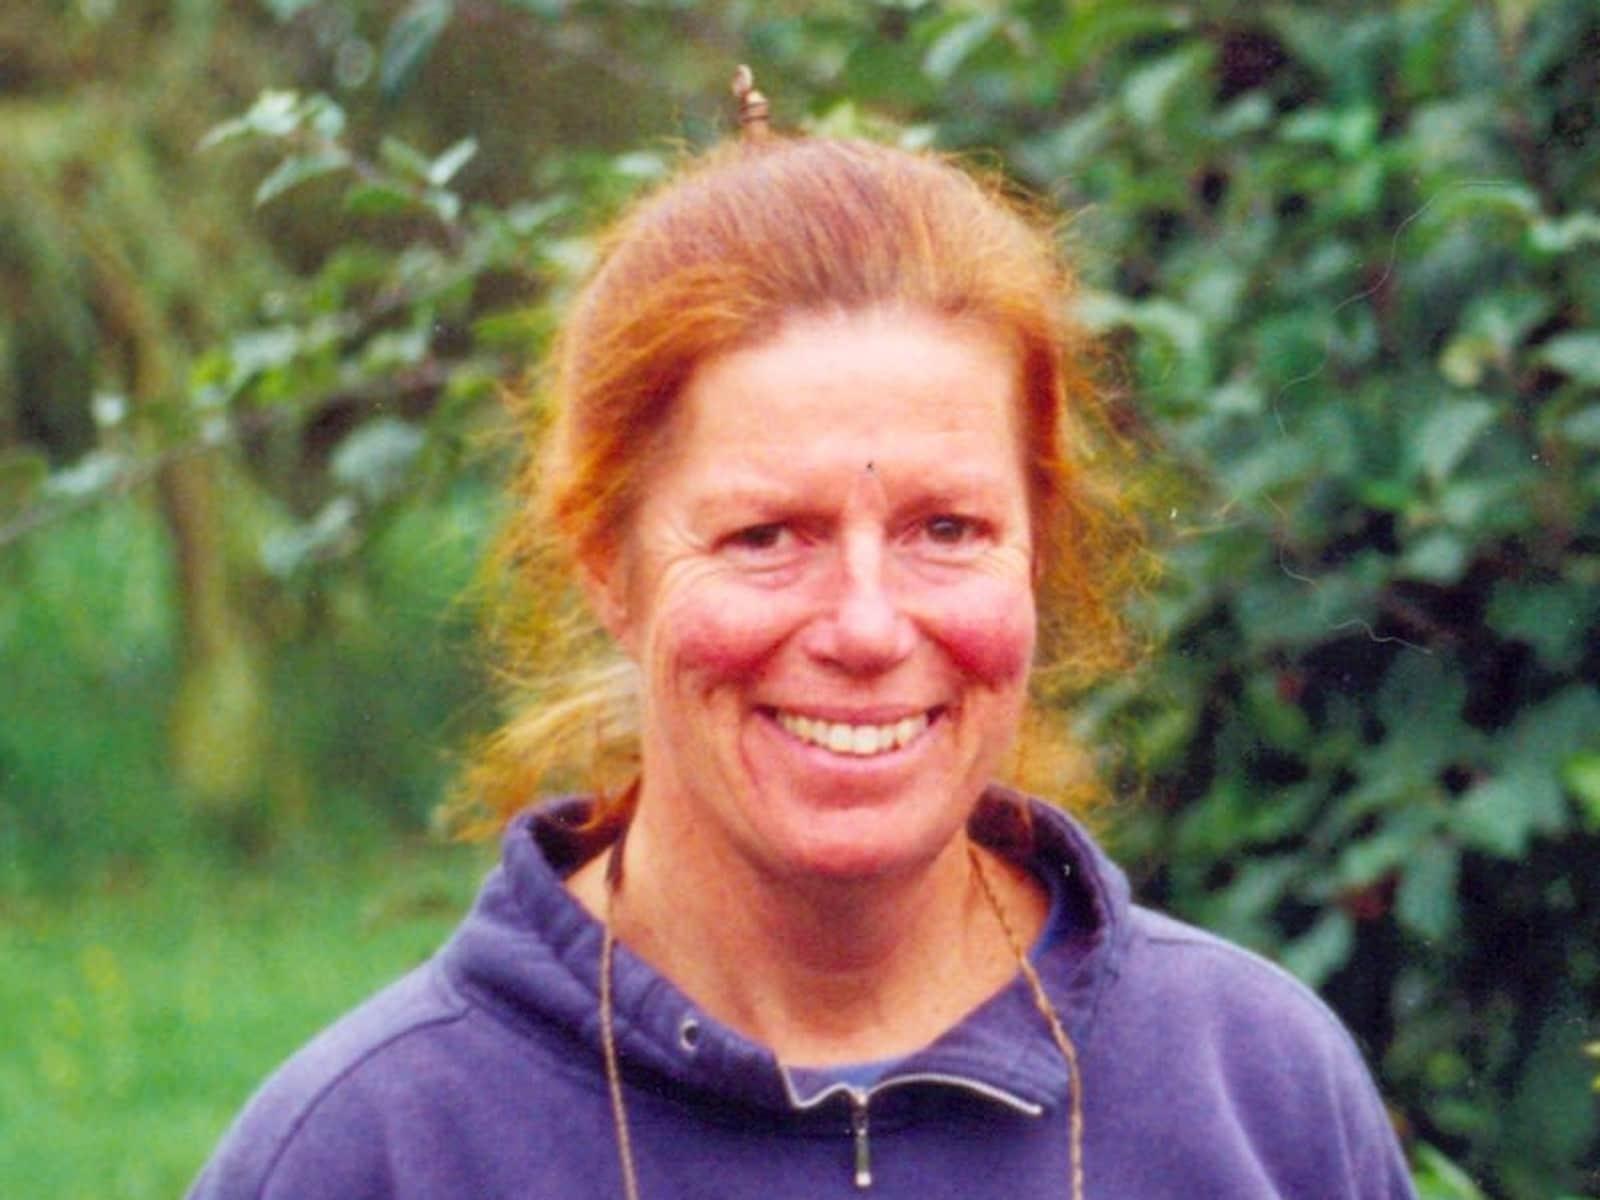 Nena from Brill, United Kingdom